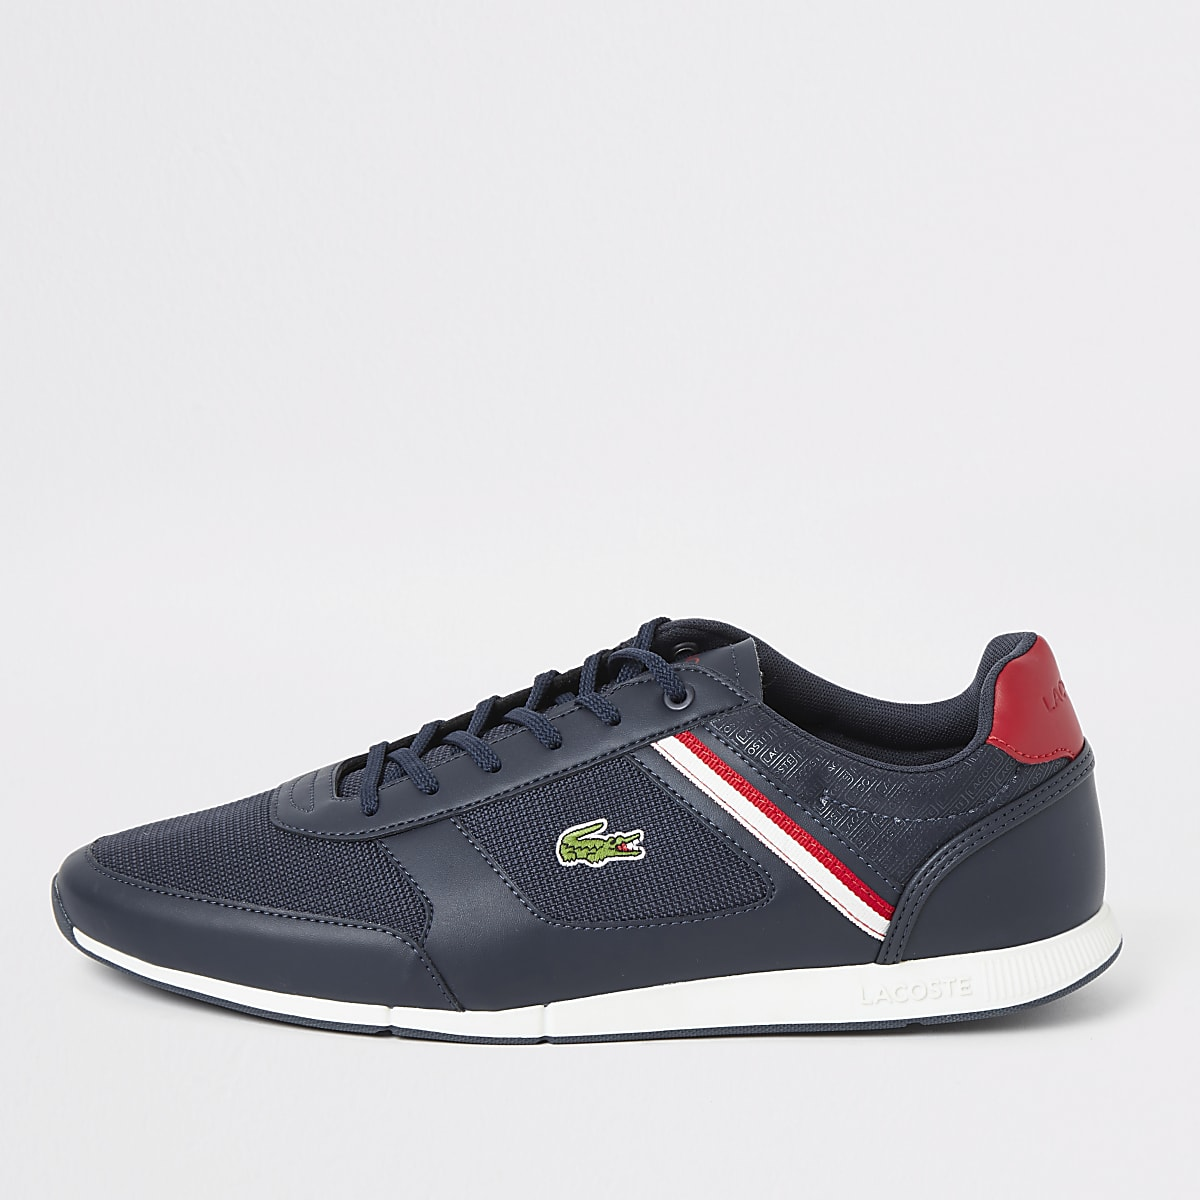 Lacoste - Menerva - Marineblauwe vetersneakers